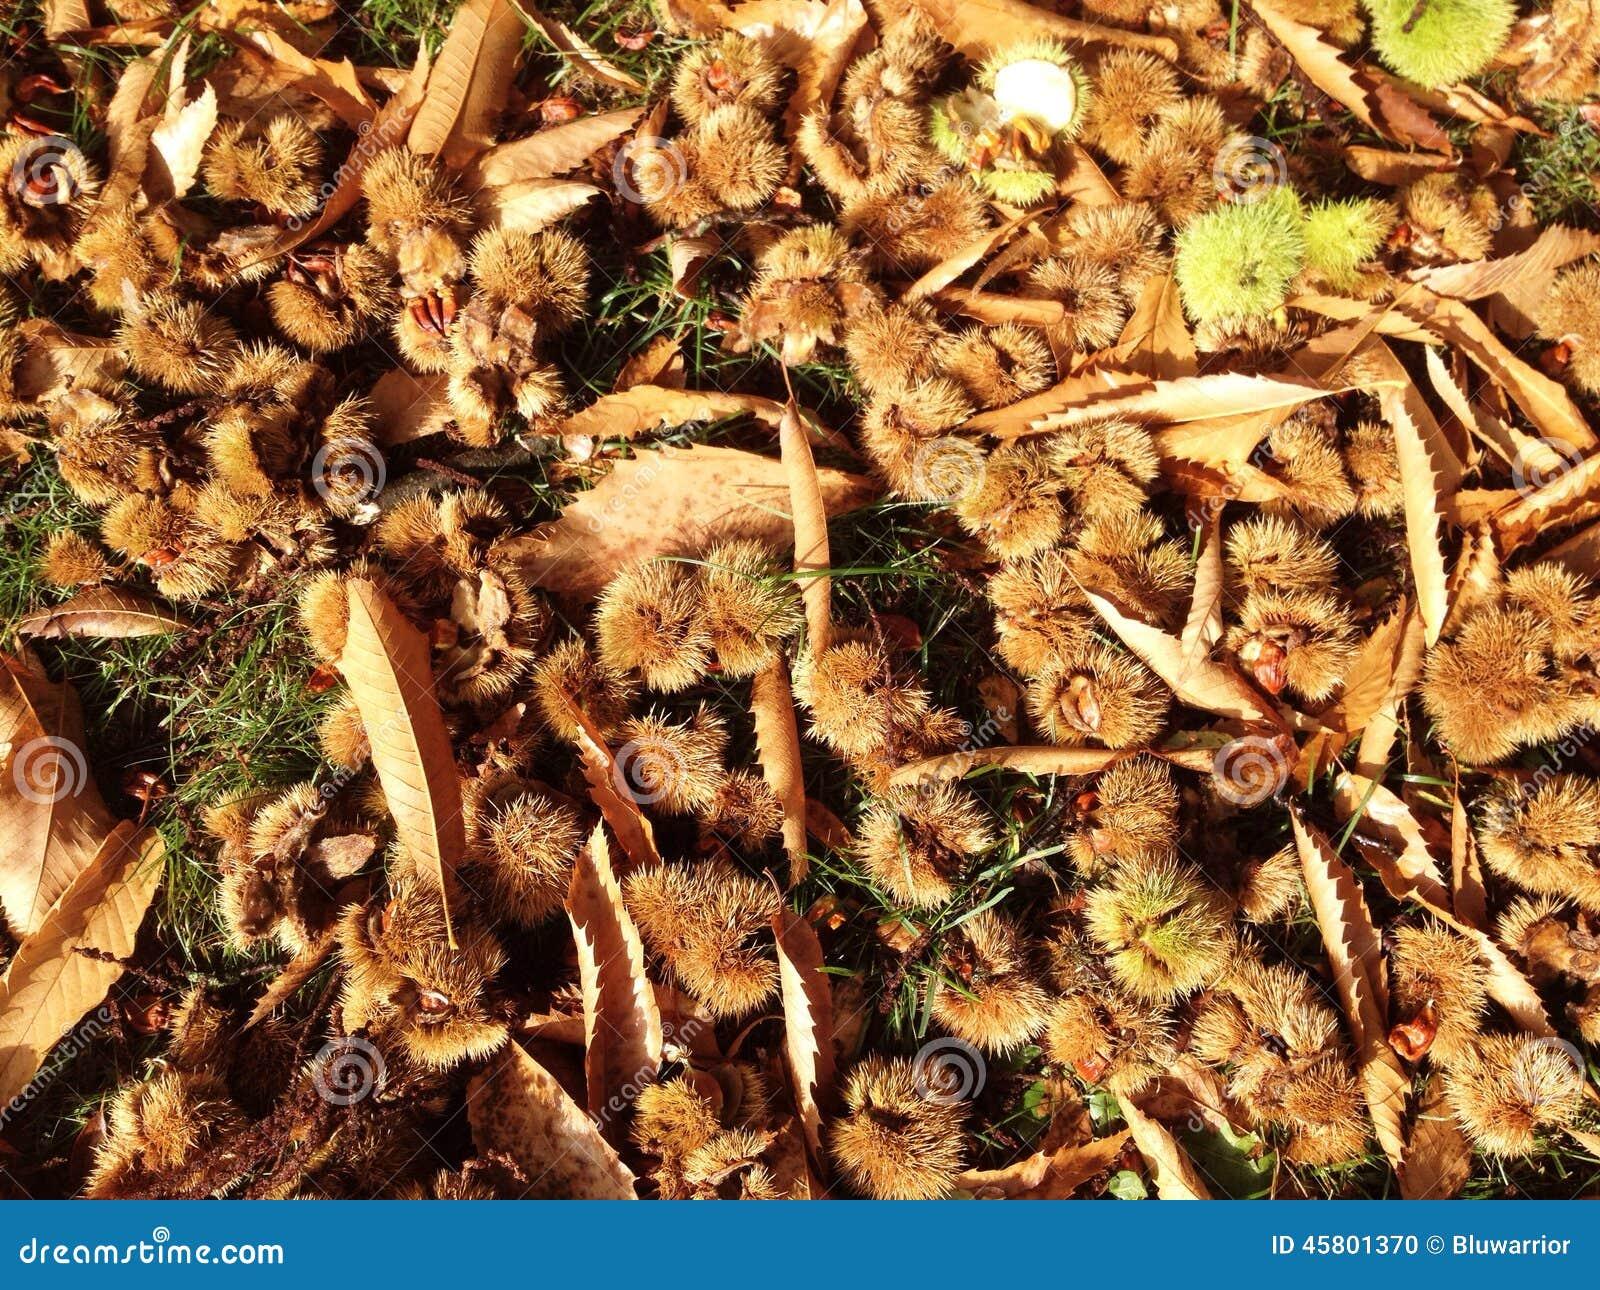 трава каштан конский фото